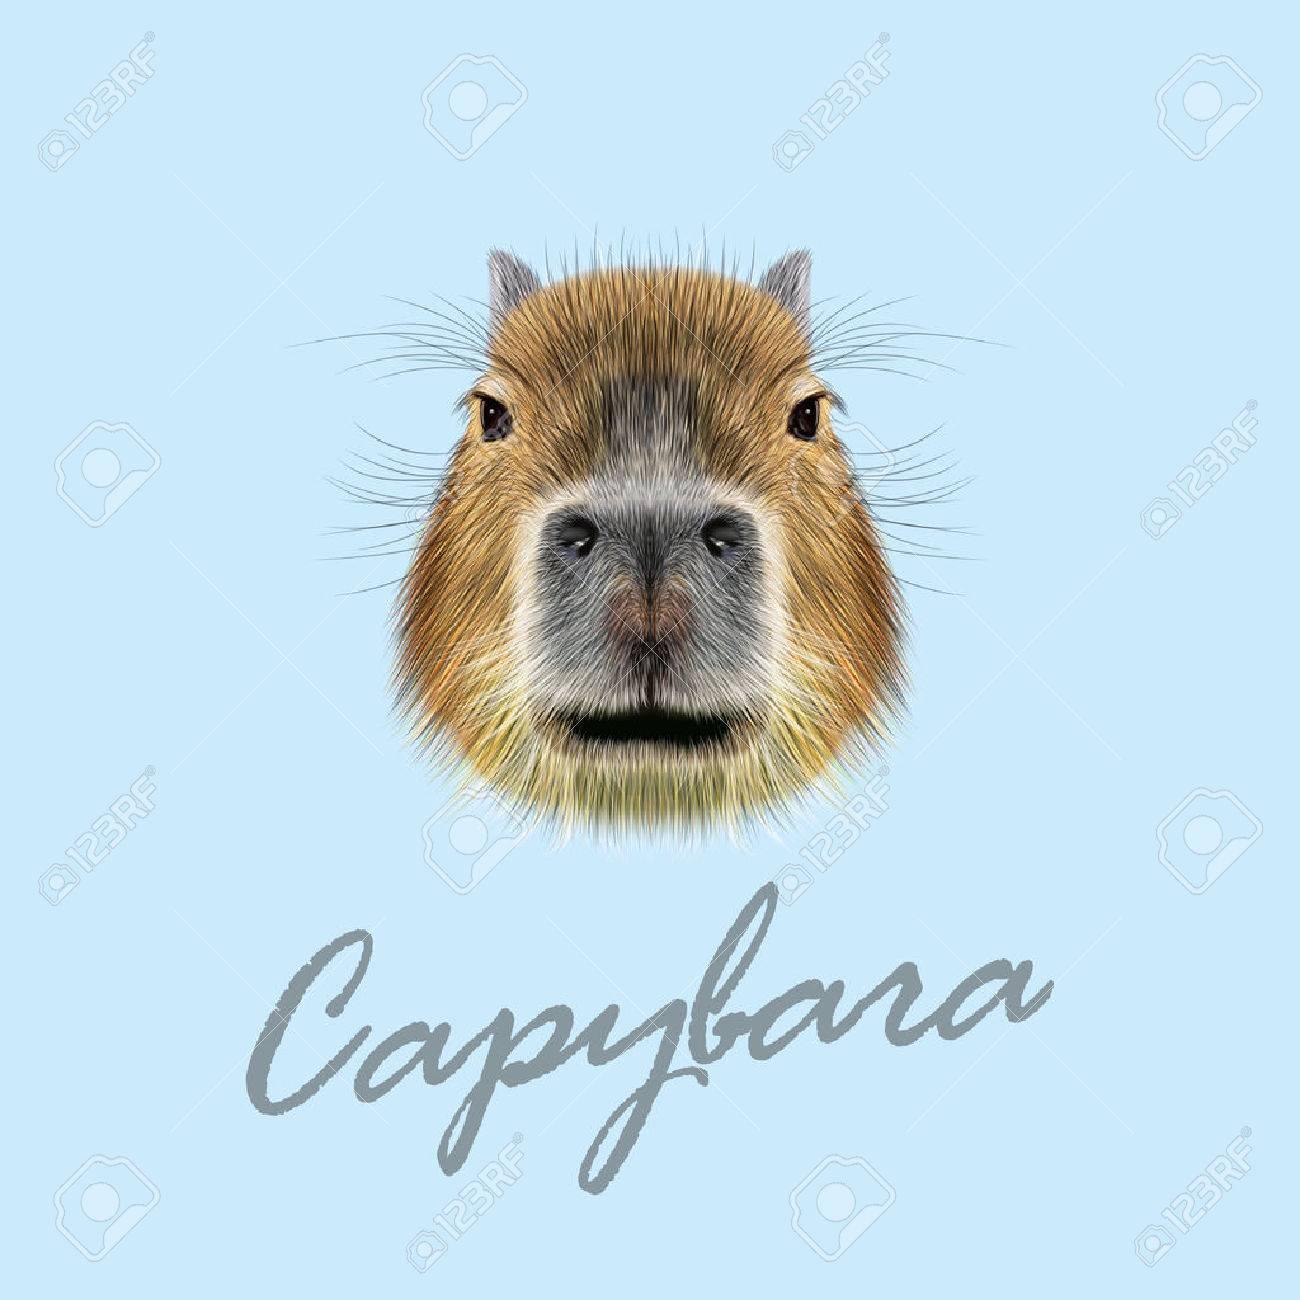 56427776-illustrated-portrait-of-capybar